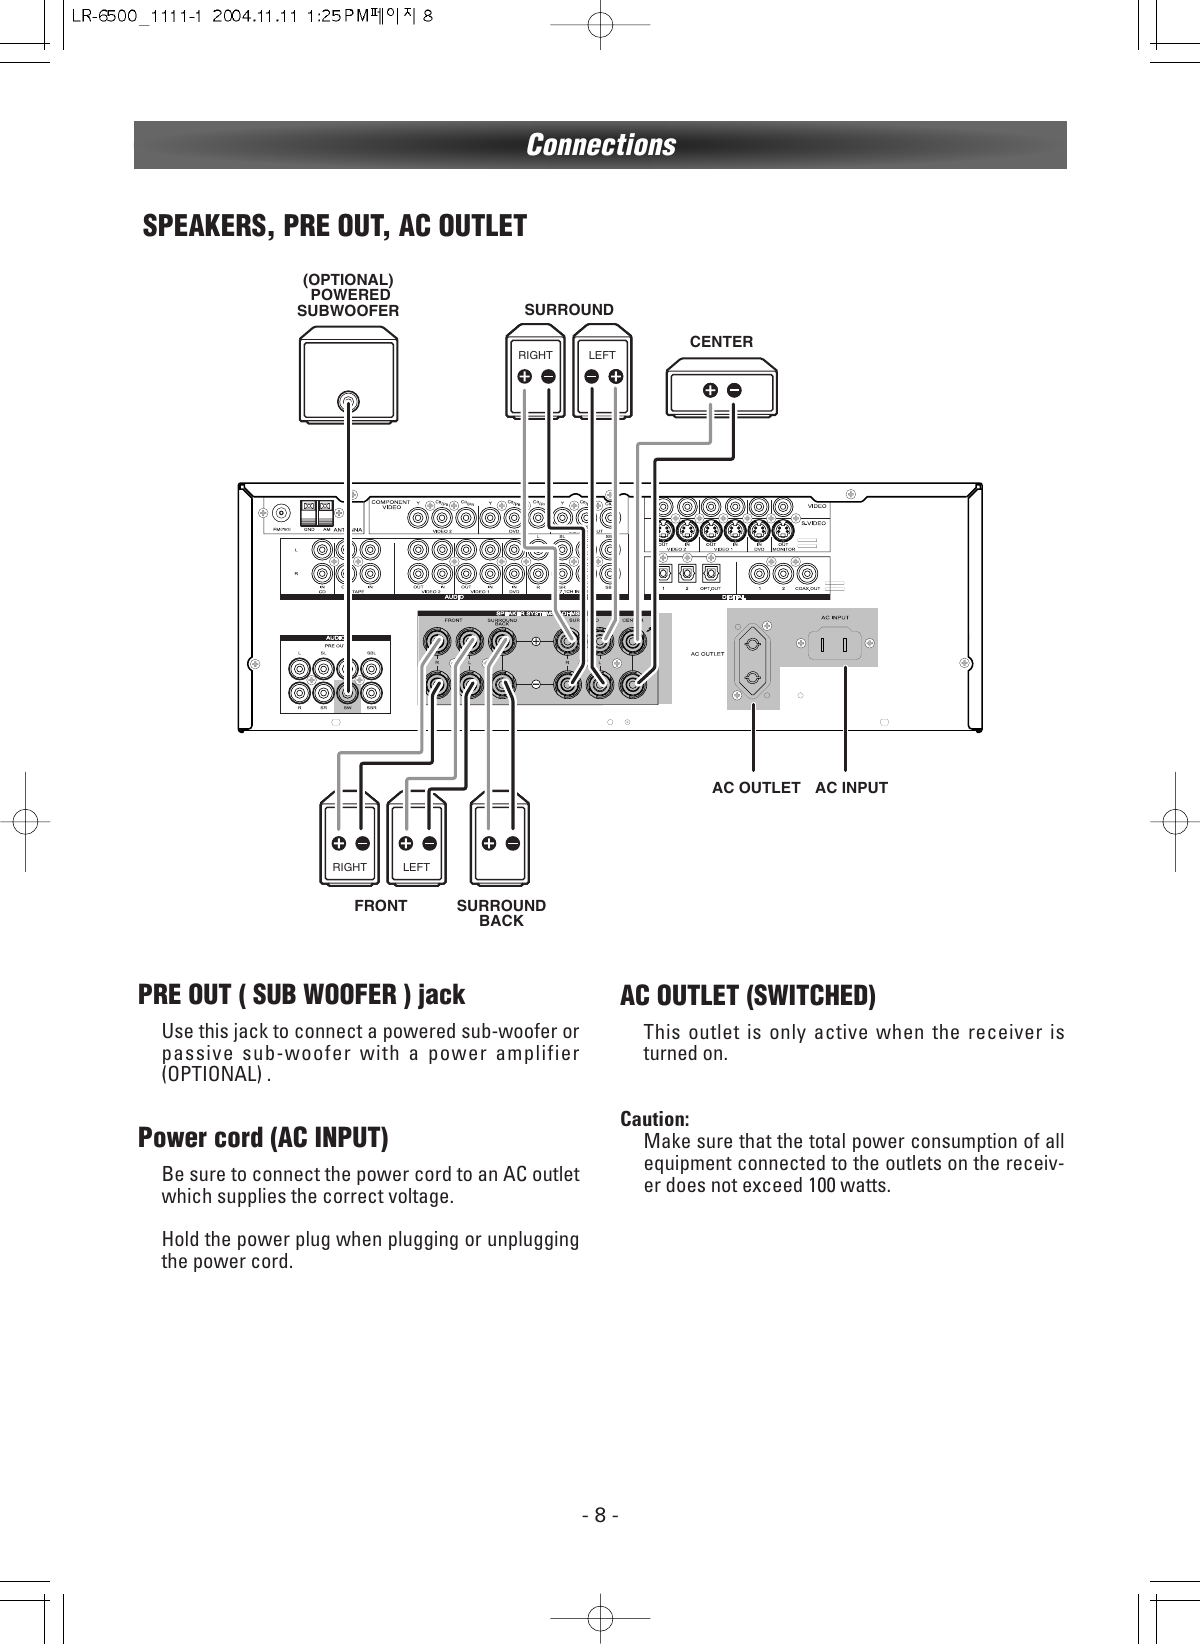 Dantax LR 6500 _1111 1 User Manual To The E88618aa 3438 69c4